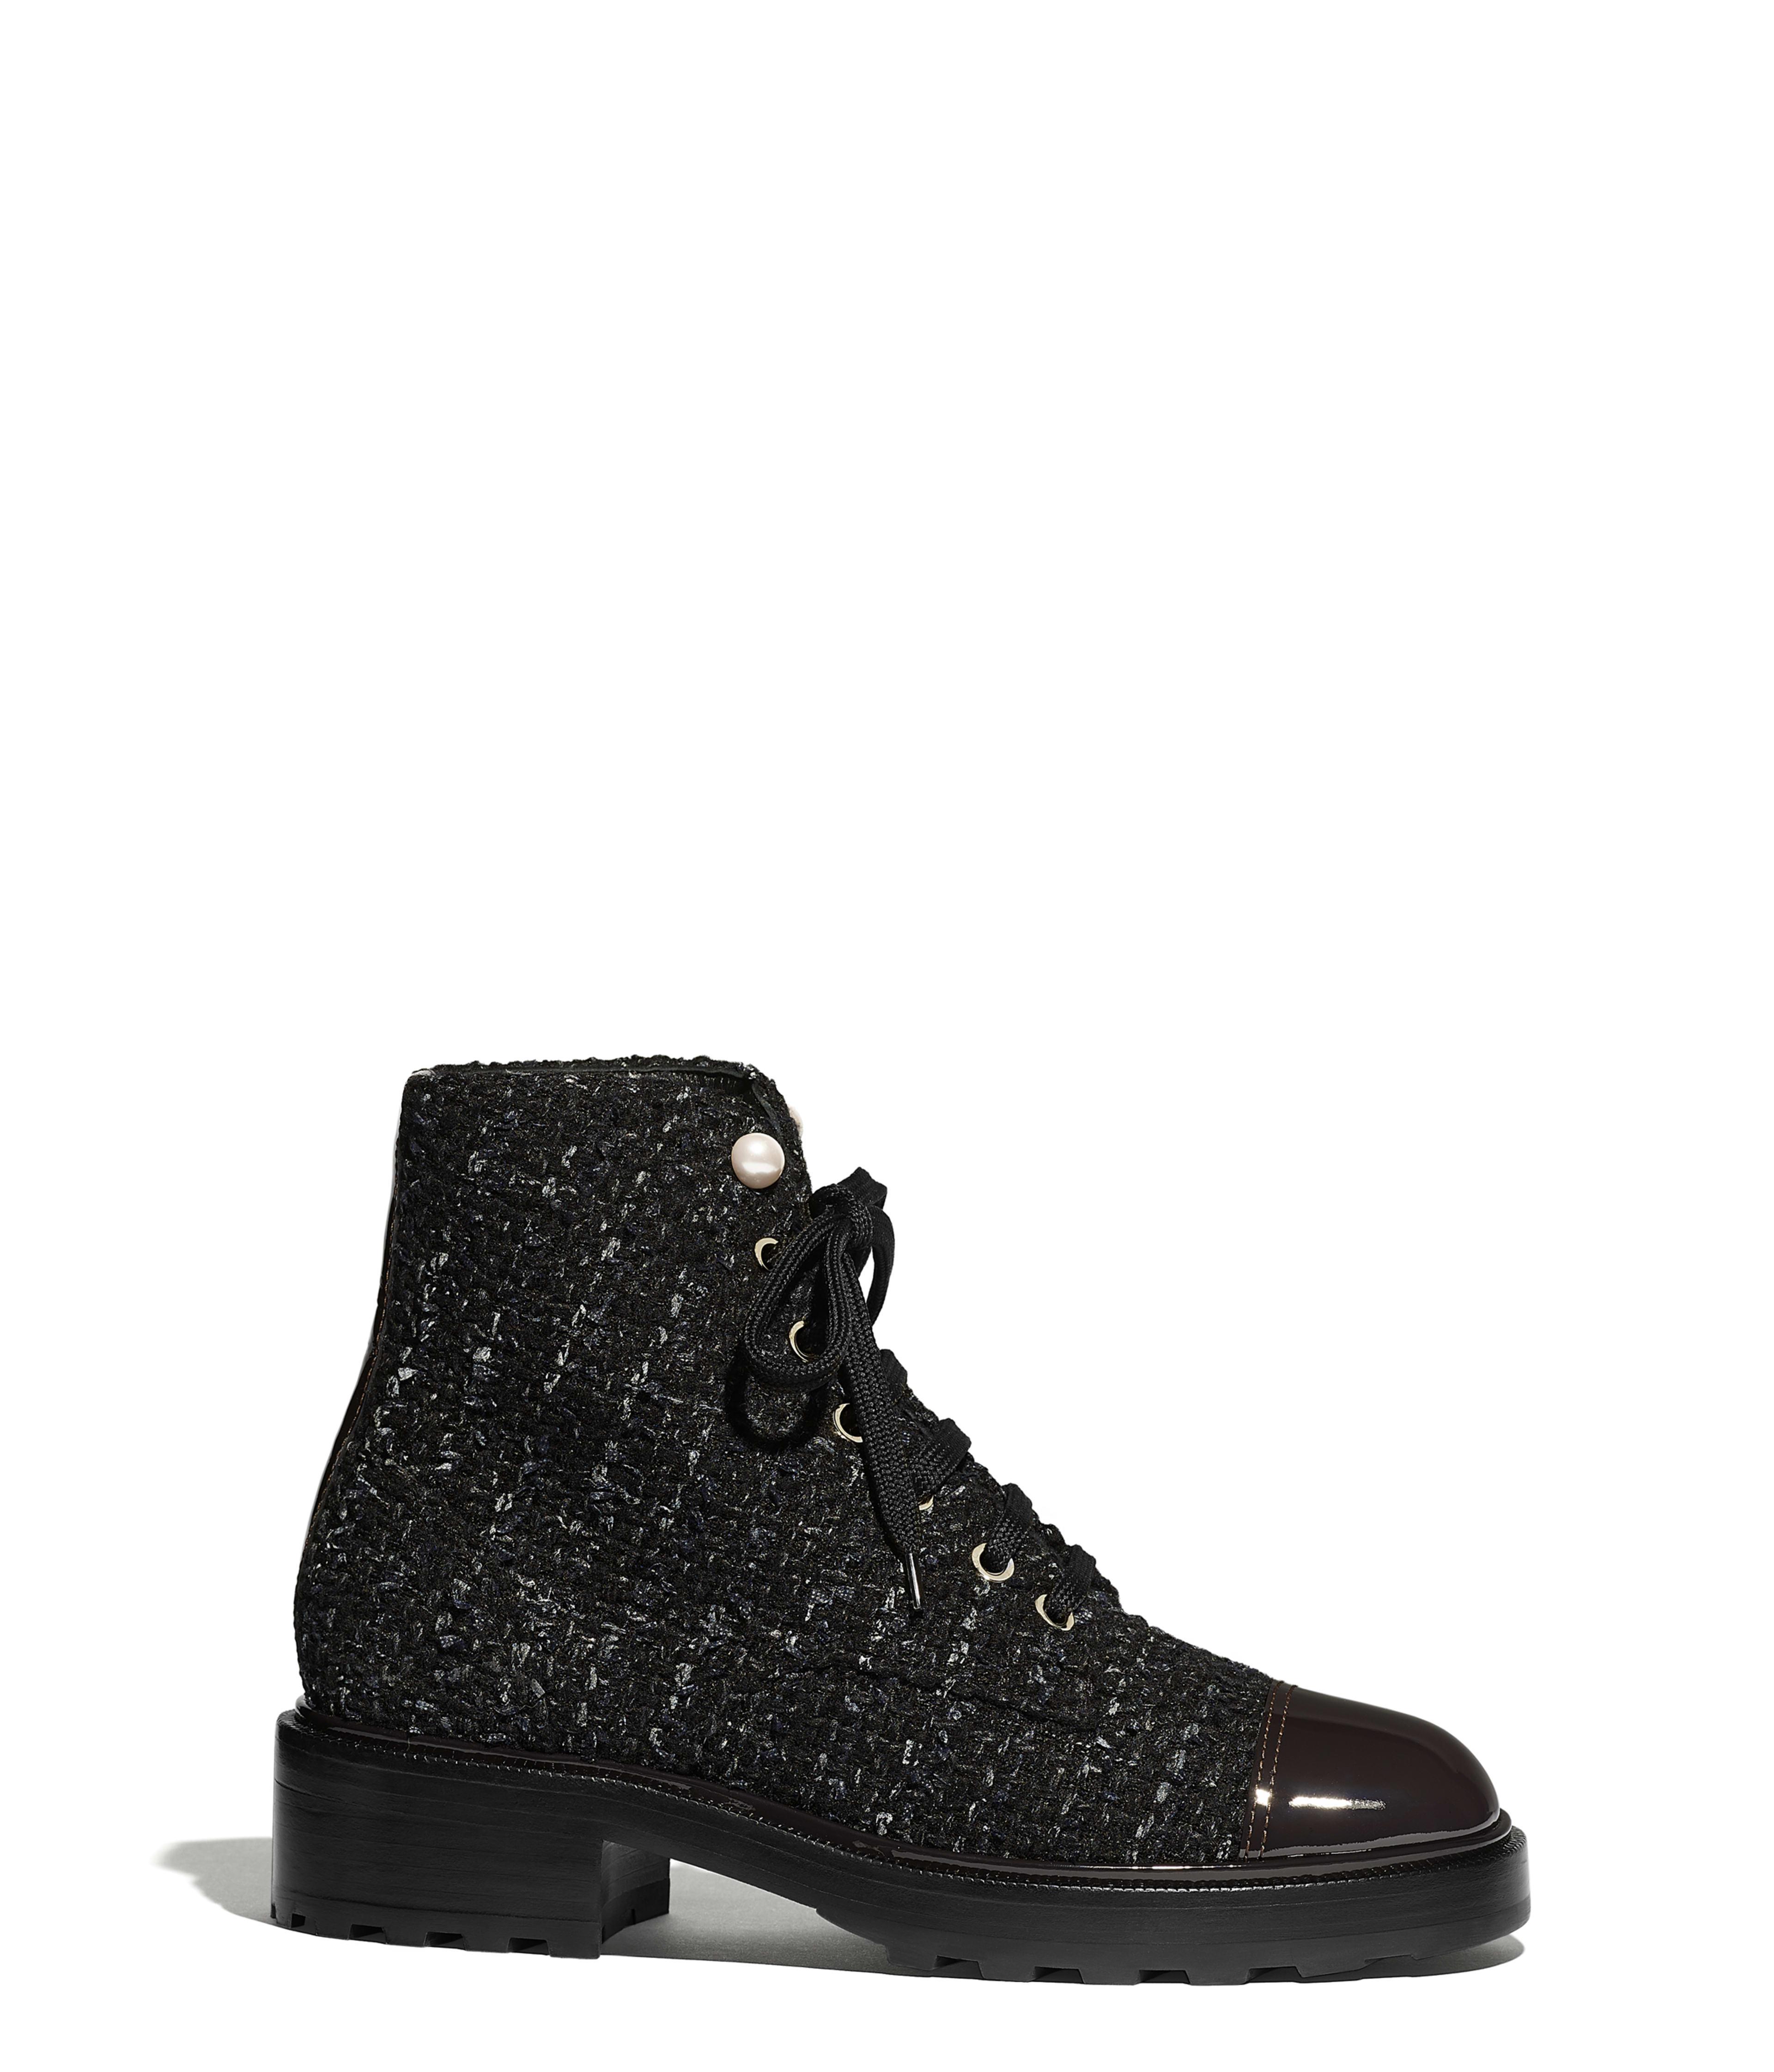 9b7905df1 Ankle Boots Tweed & Patent Calfskin, Black, Blue & Gray Ref.  G35154Y53934K1842